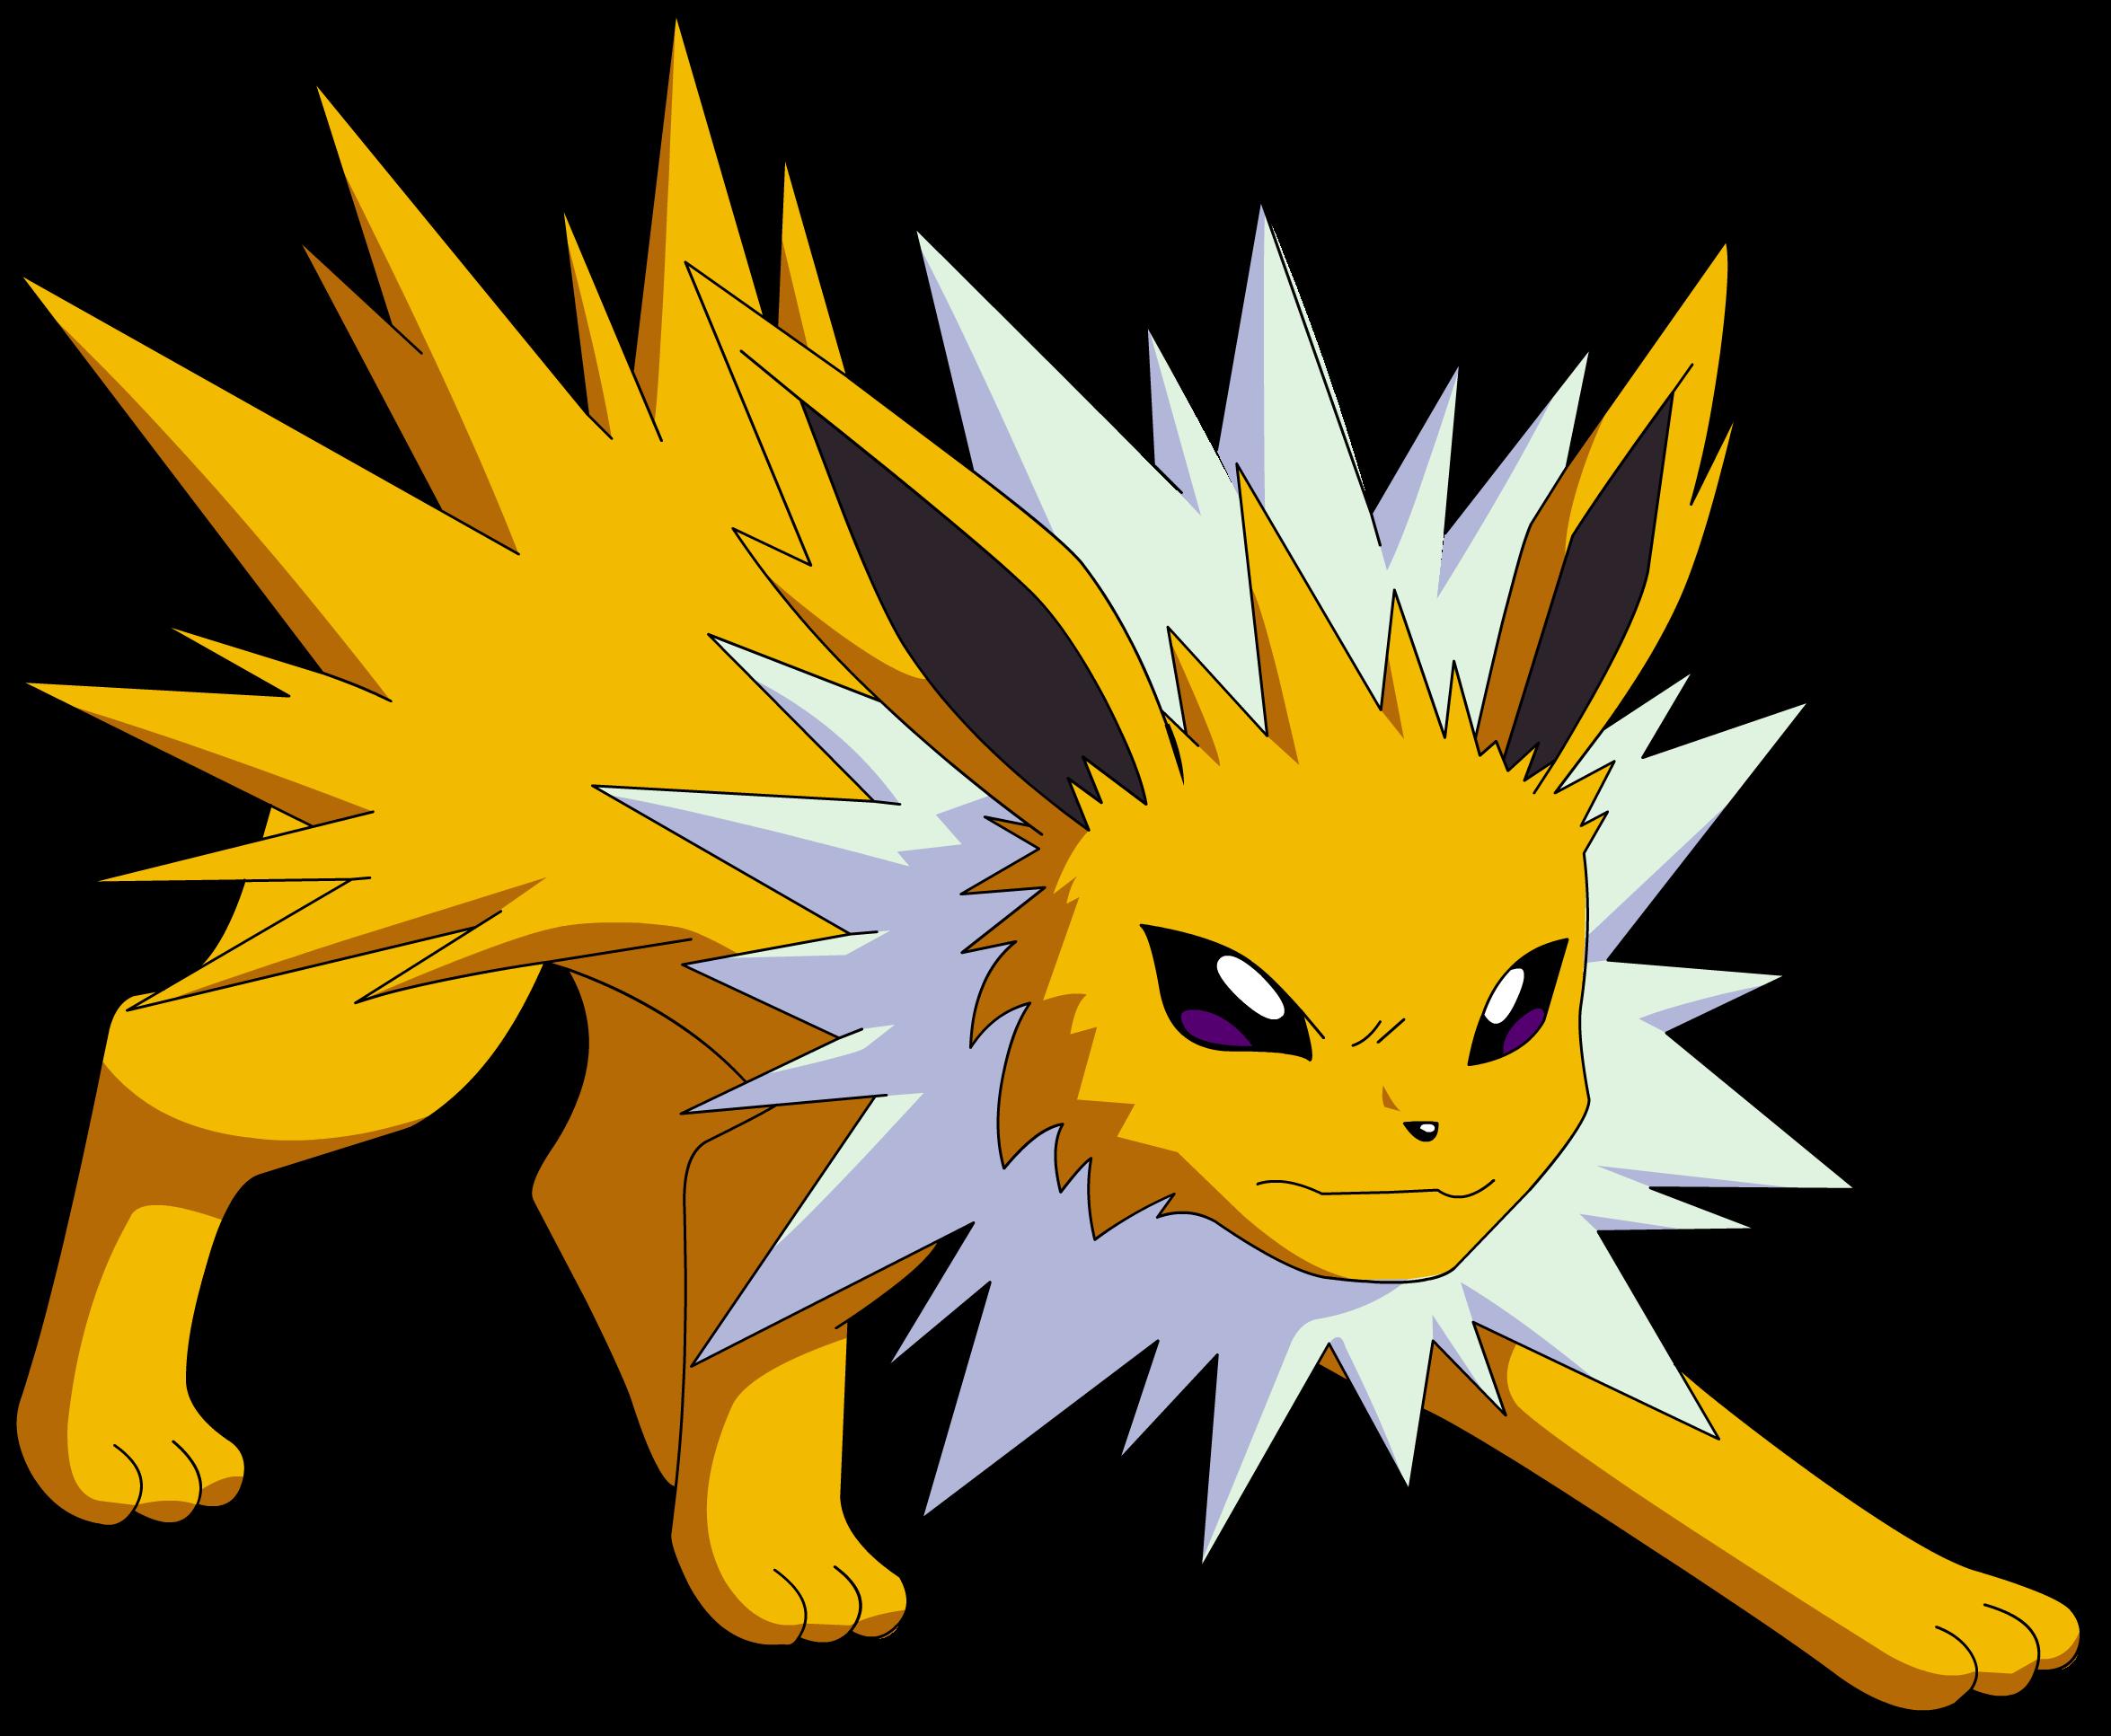 Suzzana-s-Pokemon-mariposa-region-rpg-27148273-2350-1933.png (2350×1933)